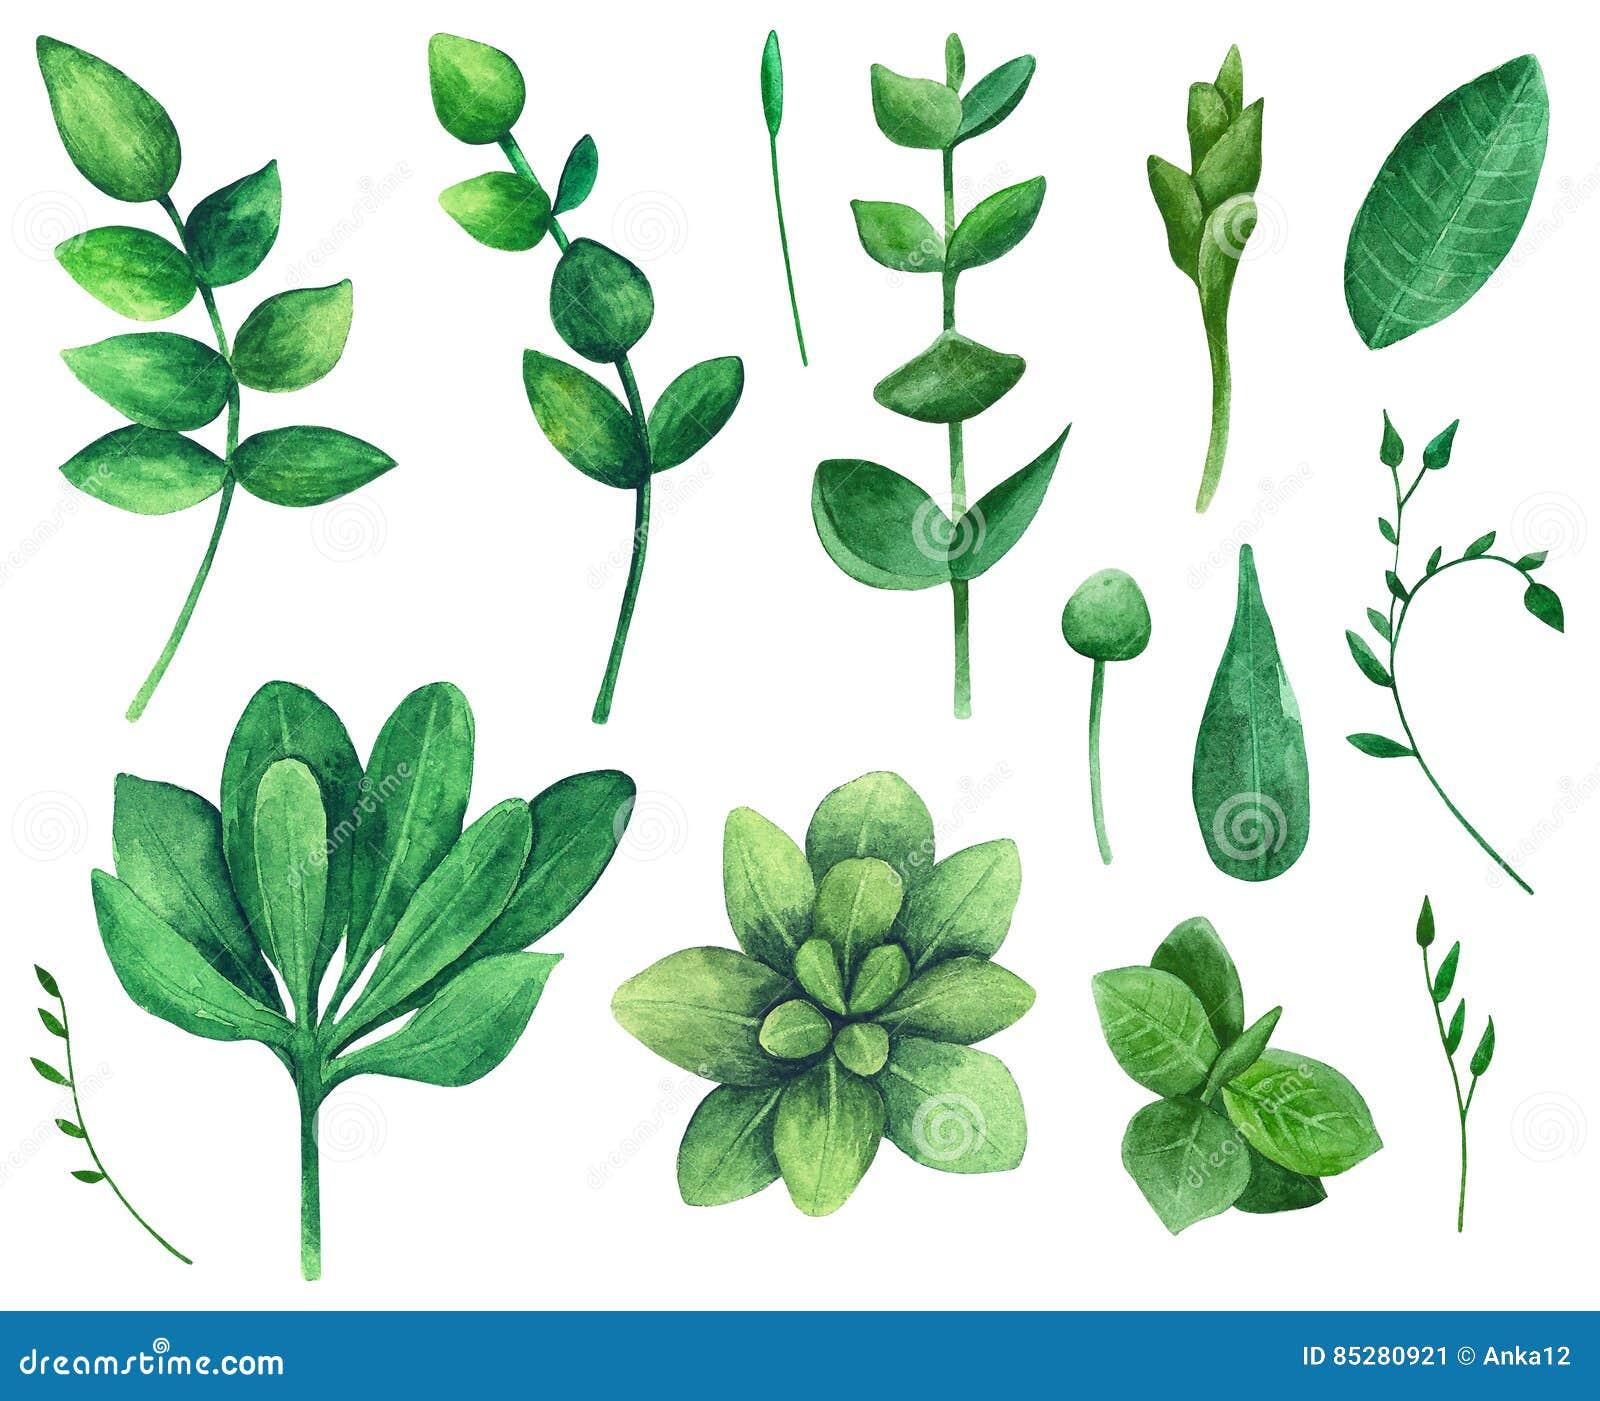 Watercolor nature clip art vector illustration for Watercolor greenery